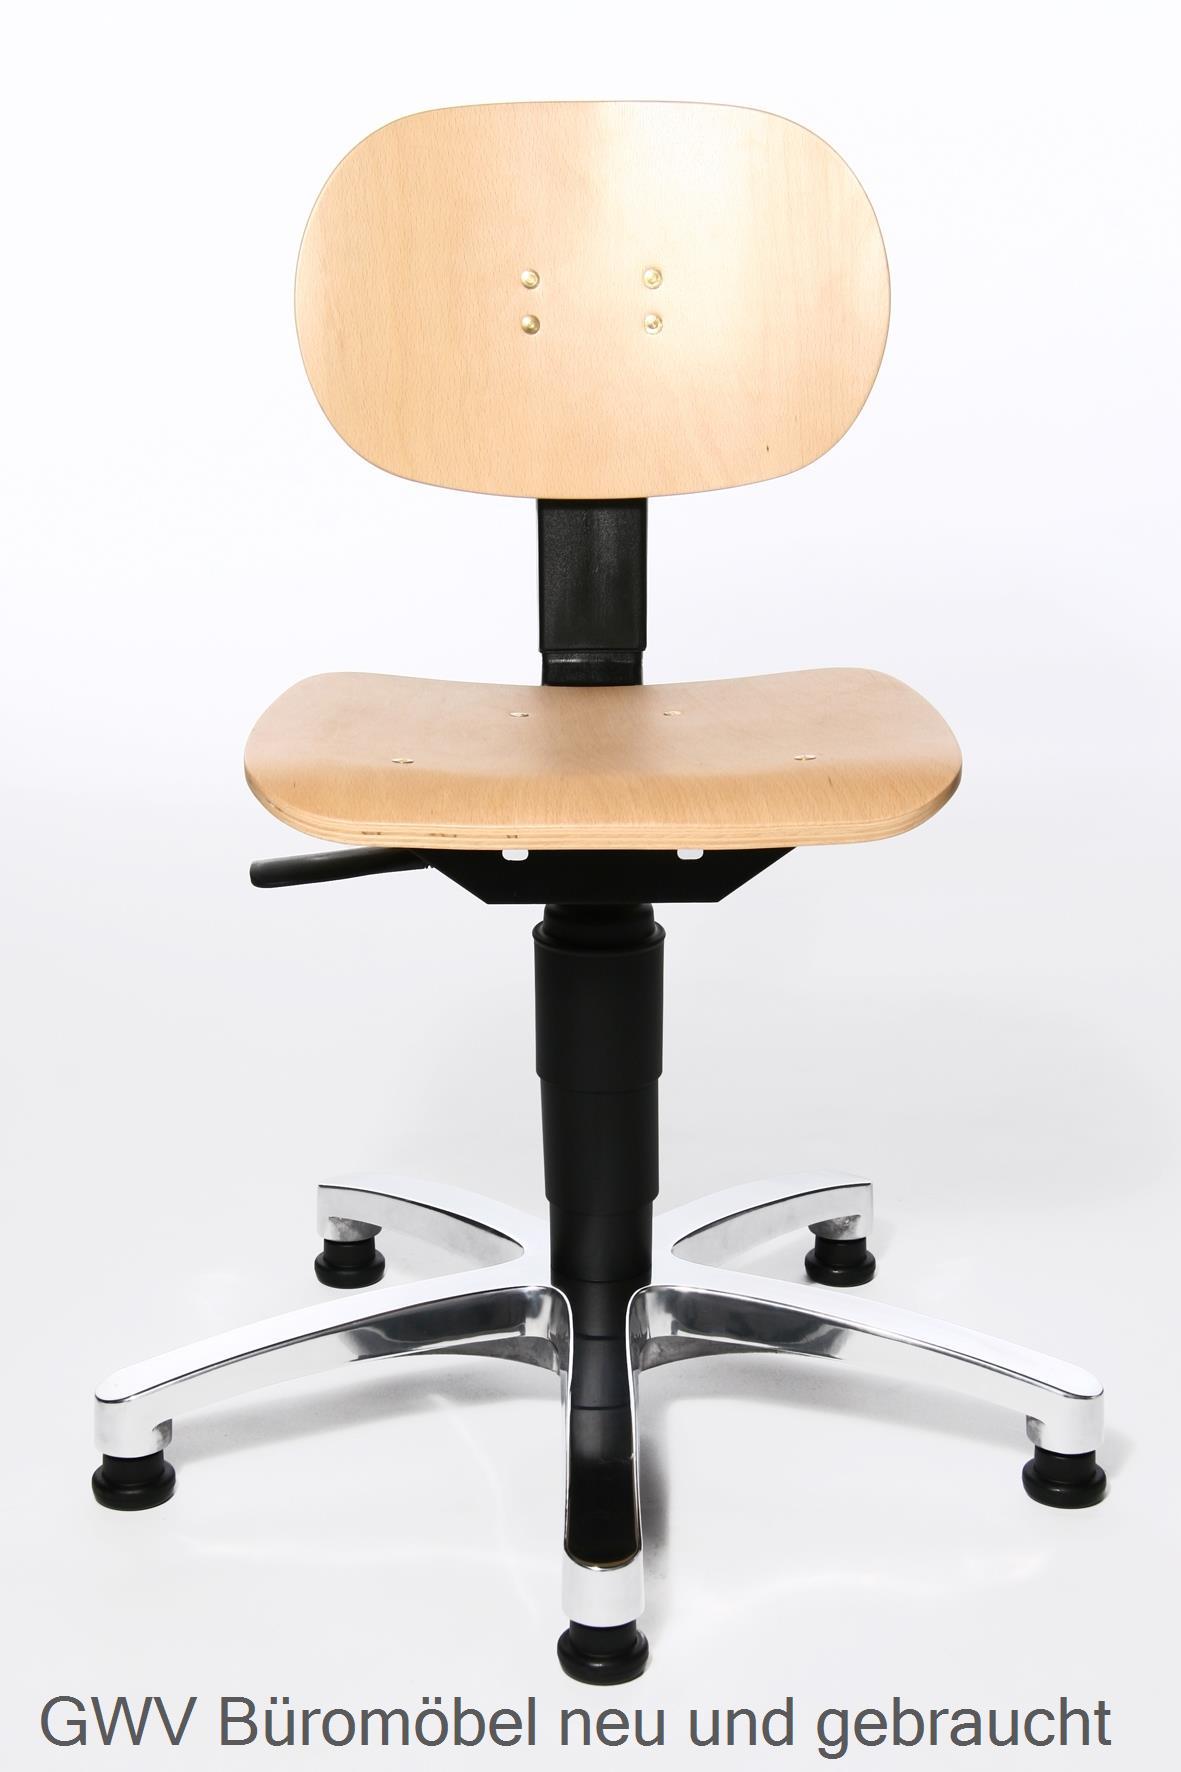 arbeits drehstuhl holz arbeitshocker neu b rostuhl neu gwv b rom bel gebraucht sofort. Black Bedroom Furniture Sets. Home Design Ideas